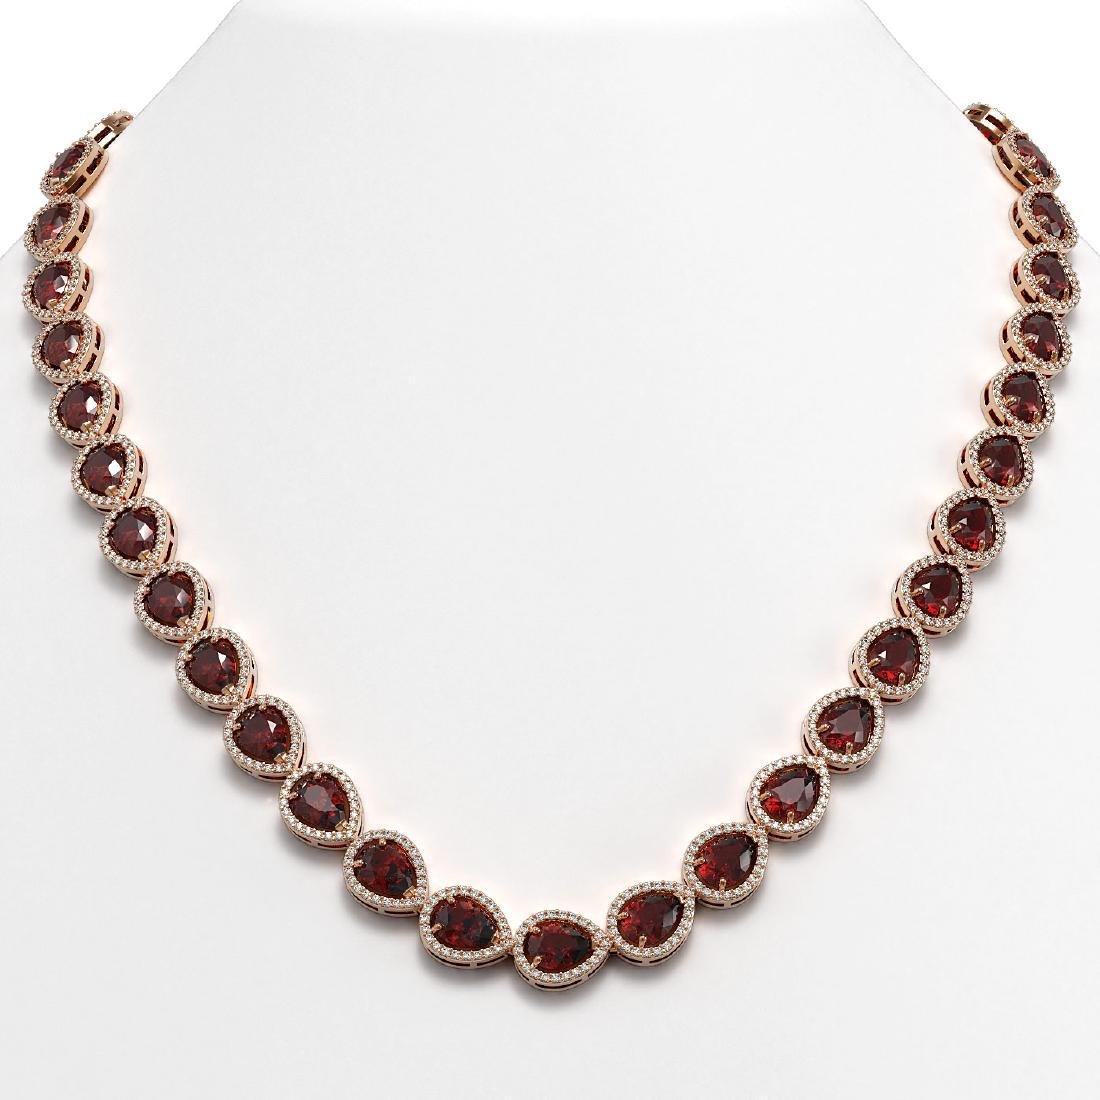 36.93 CTW Garnet & Diamond Halo Necklace 10K Rose Gold